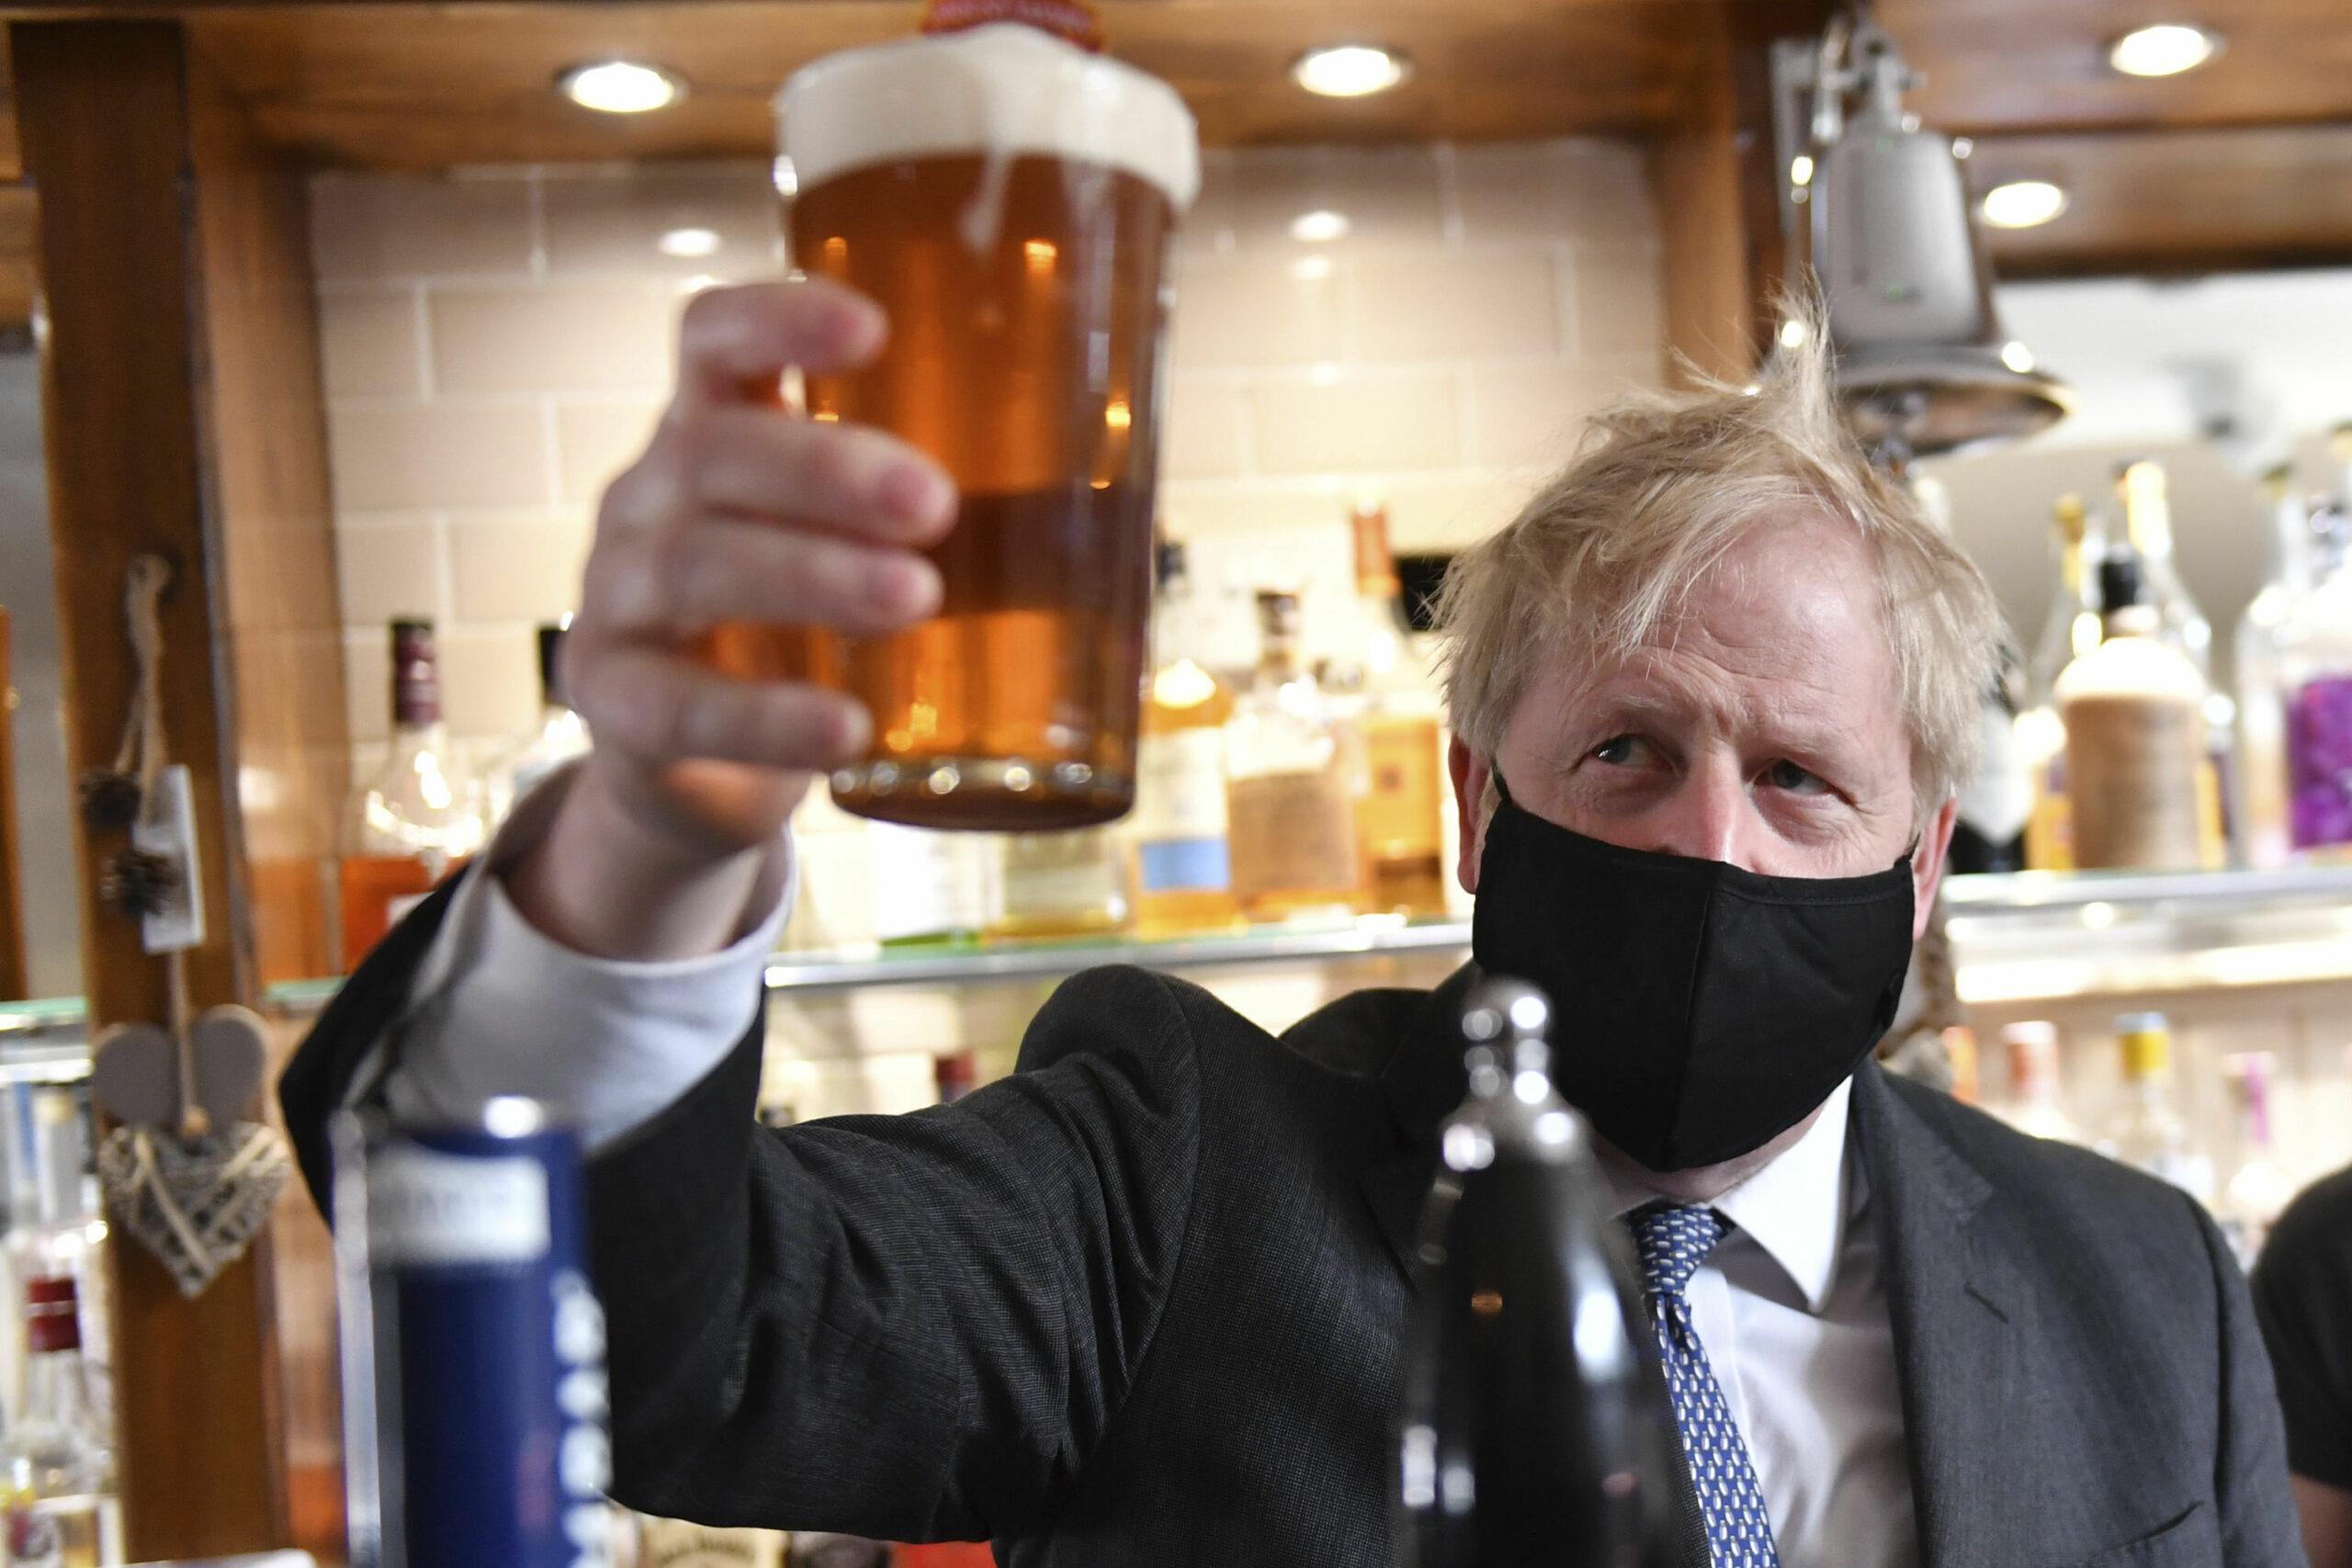 Regno Unito, cittadini europei espulsi perchè immigrati irregolari